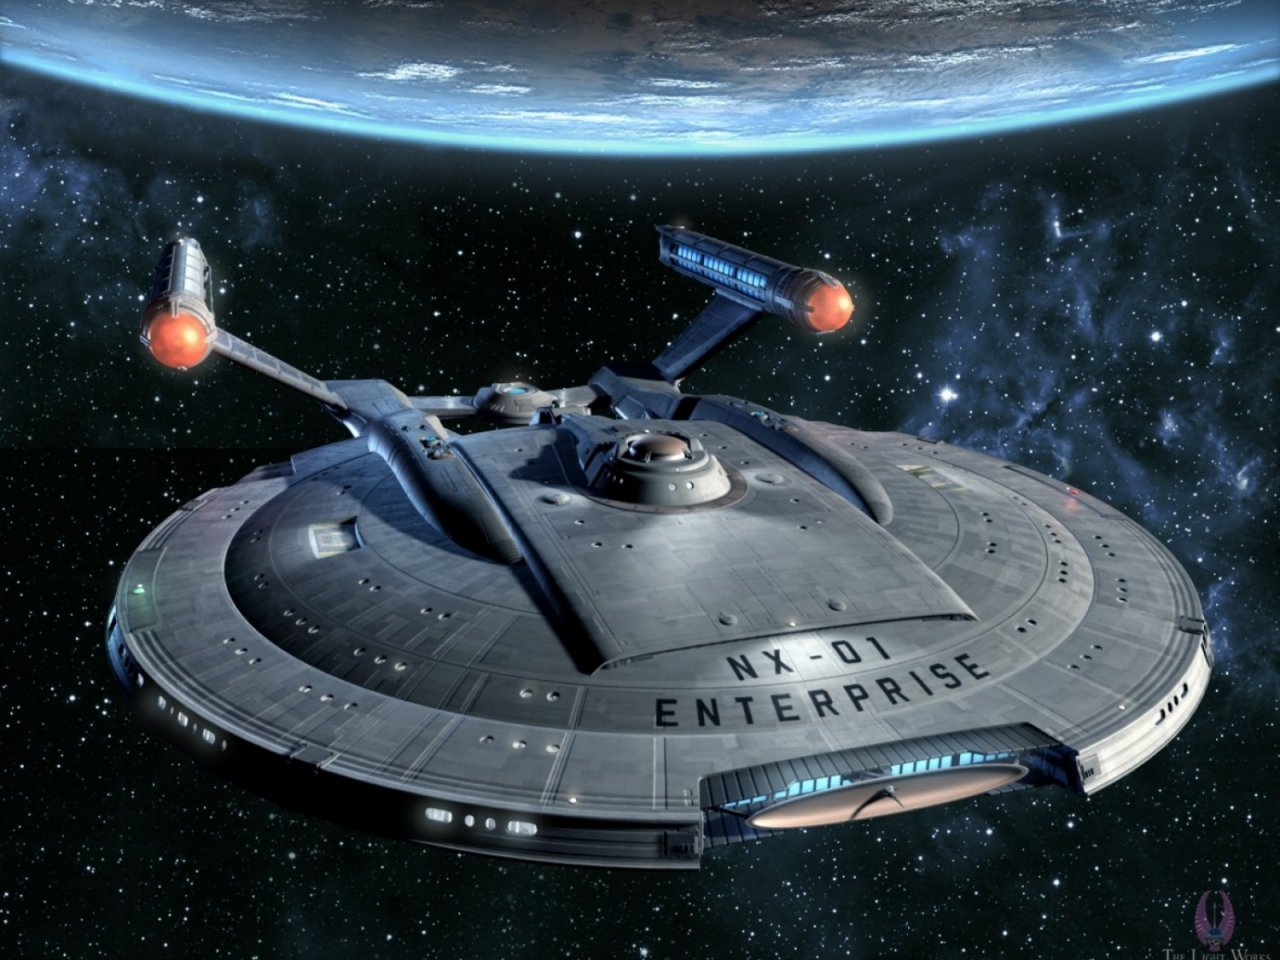 Details about Eaglemoss Diecast Star Trek Enterprise NX 01 EM ST0004 1280x960